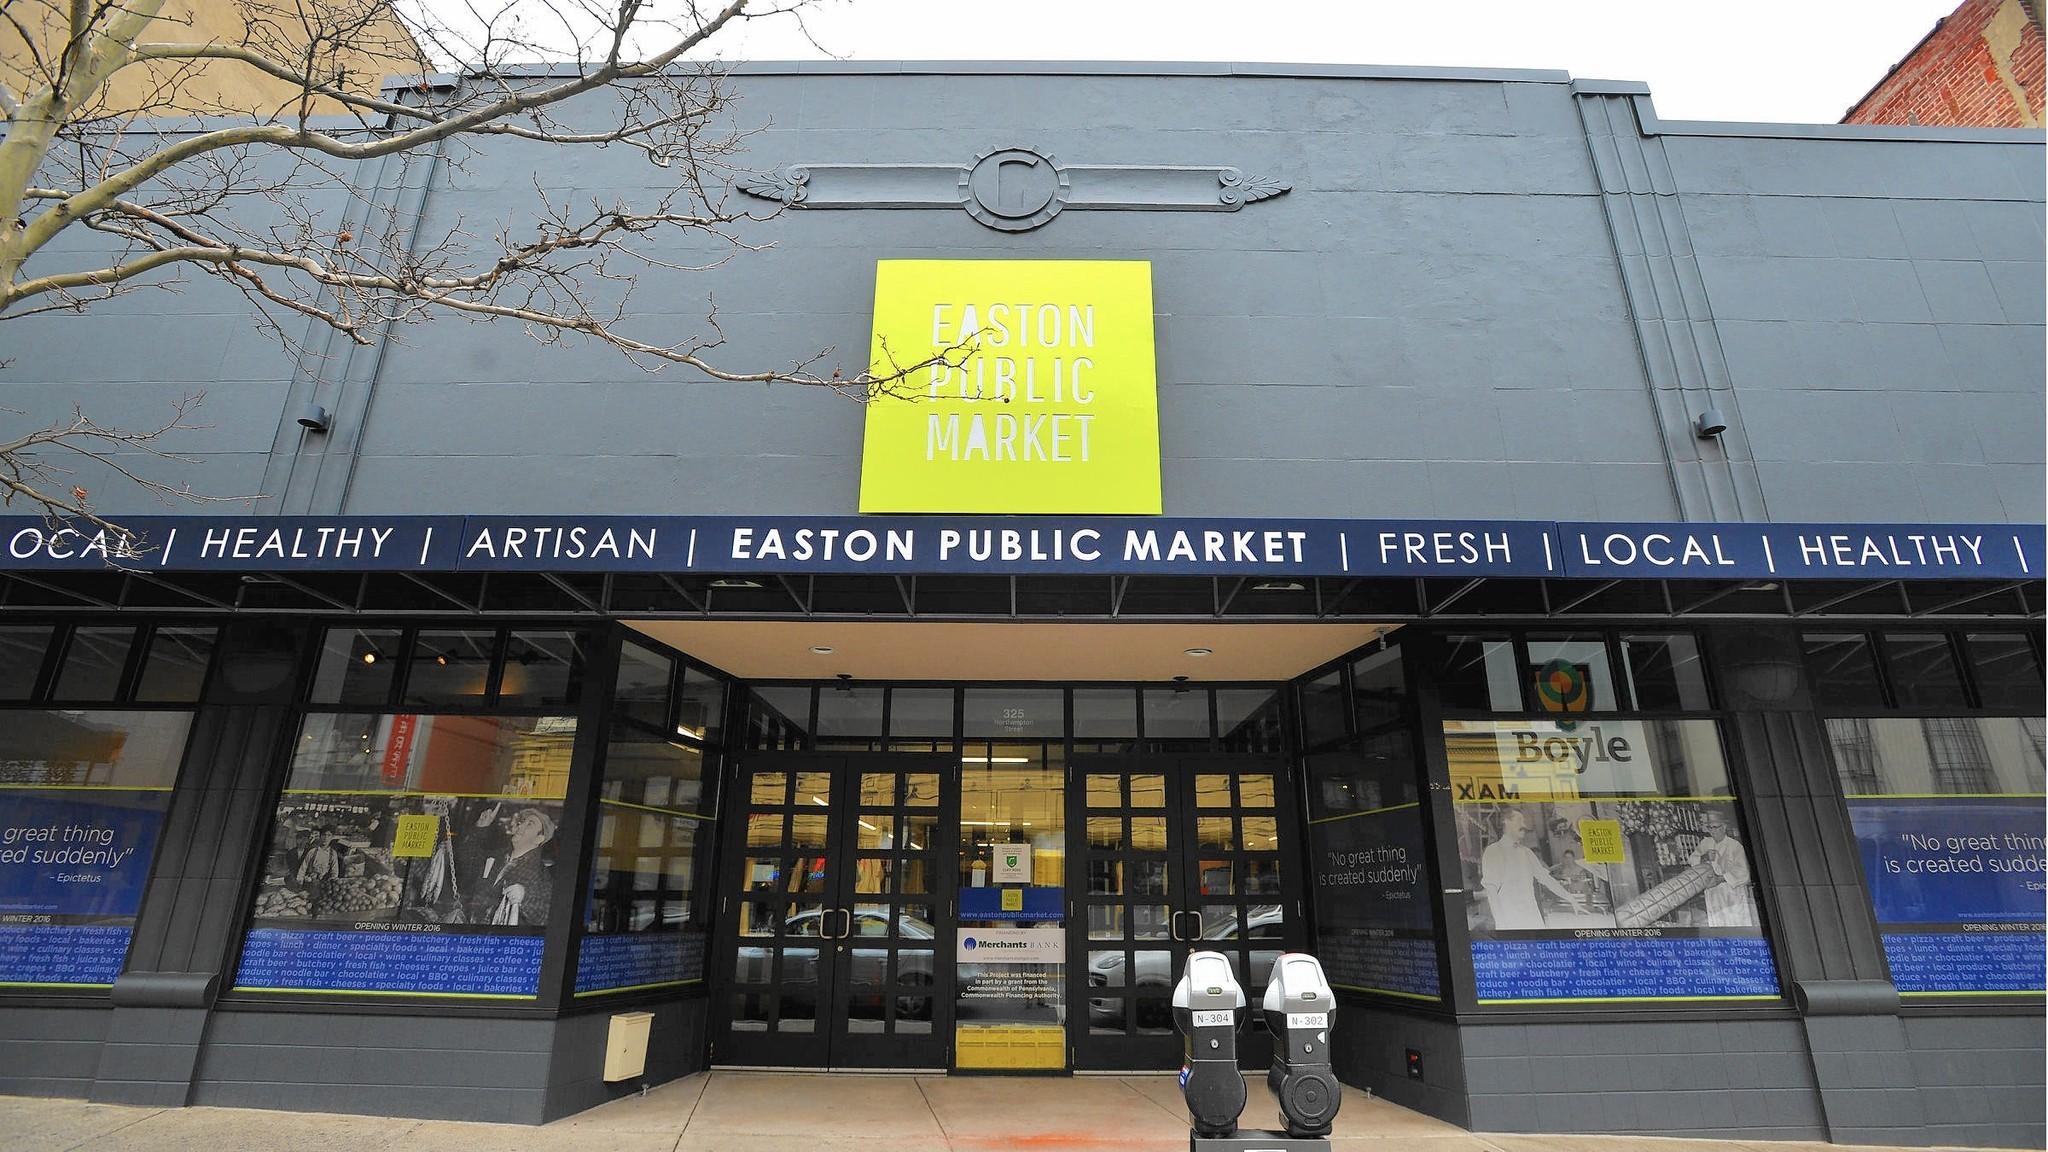 mc-gp-easton-pubilc-market-opens-20160413.jpg